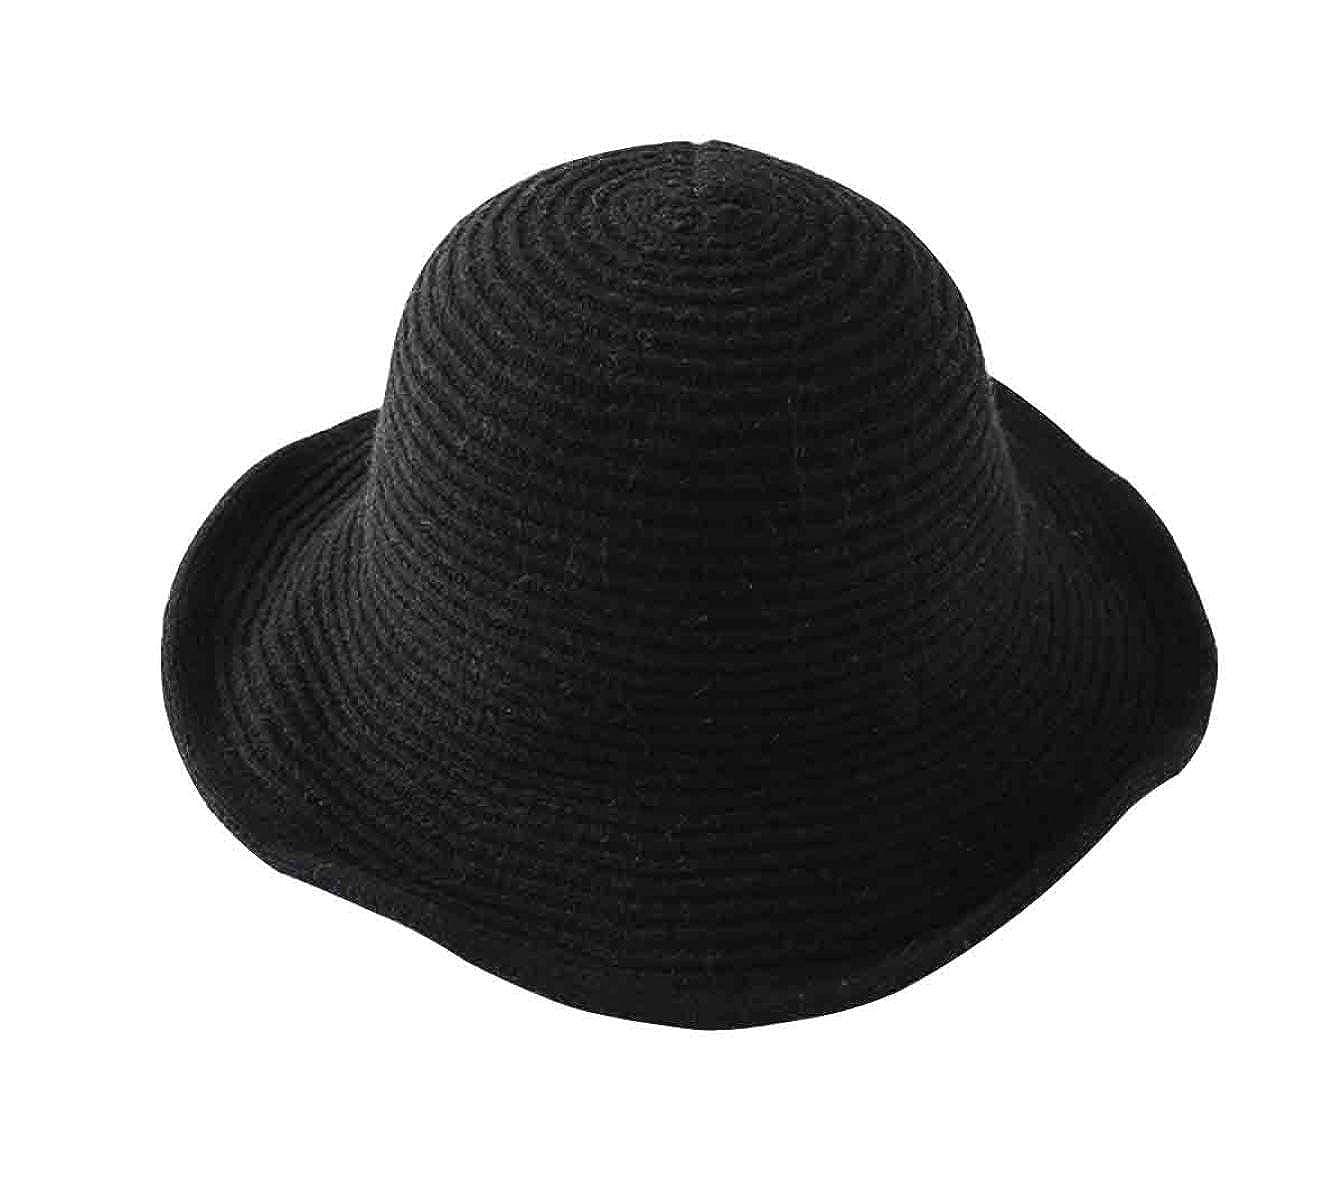 ZHMIAO Otoño Invierno Dama Sombrero De Punto Sombrero De Pescador ... b0ab94c9d4e